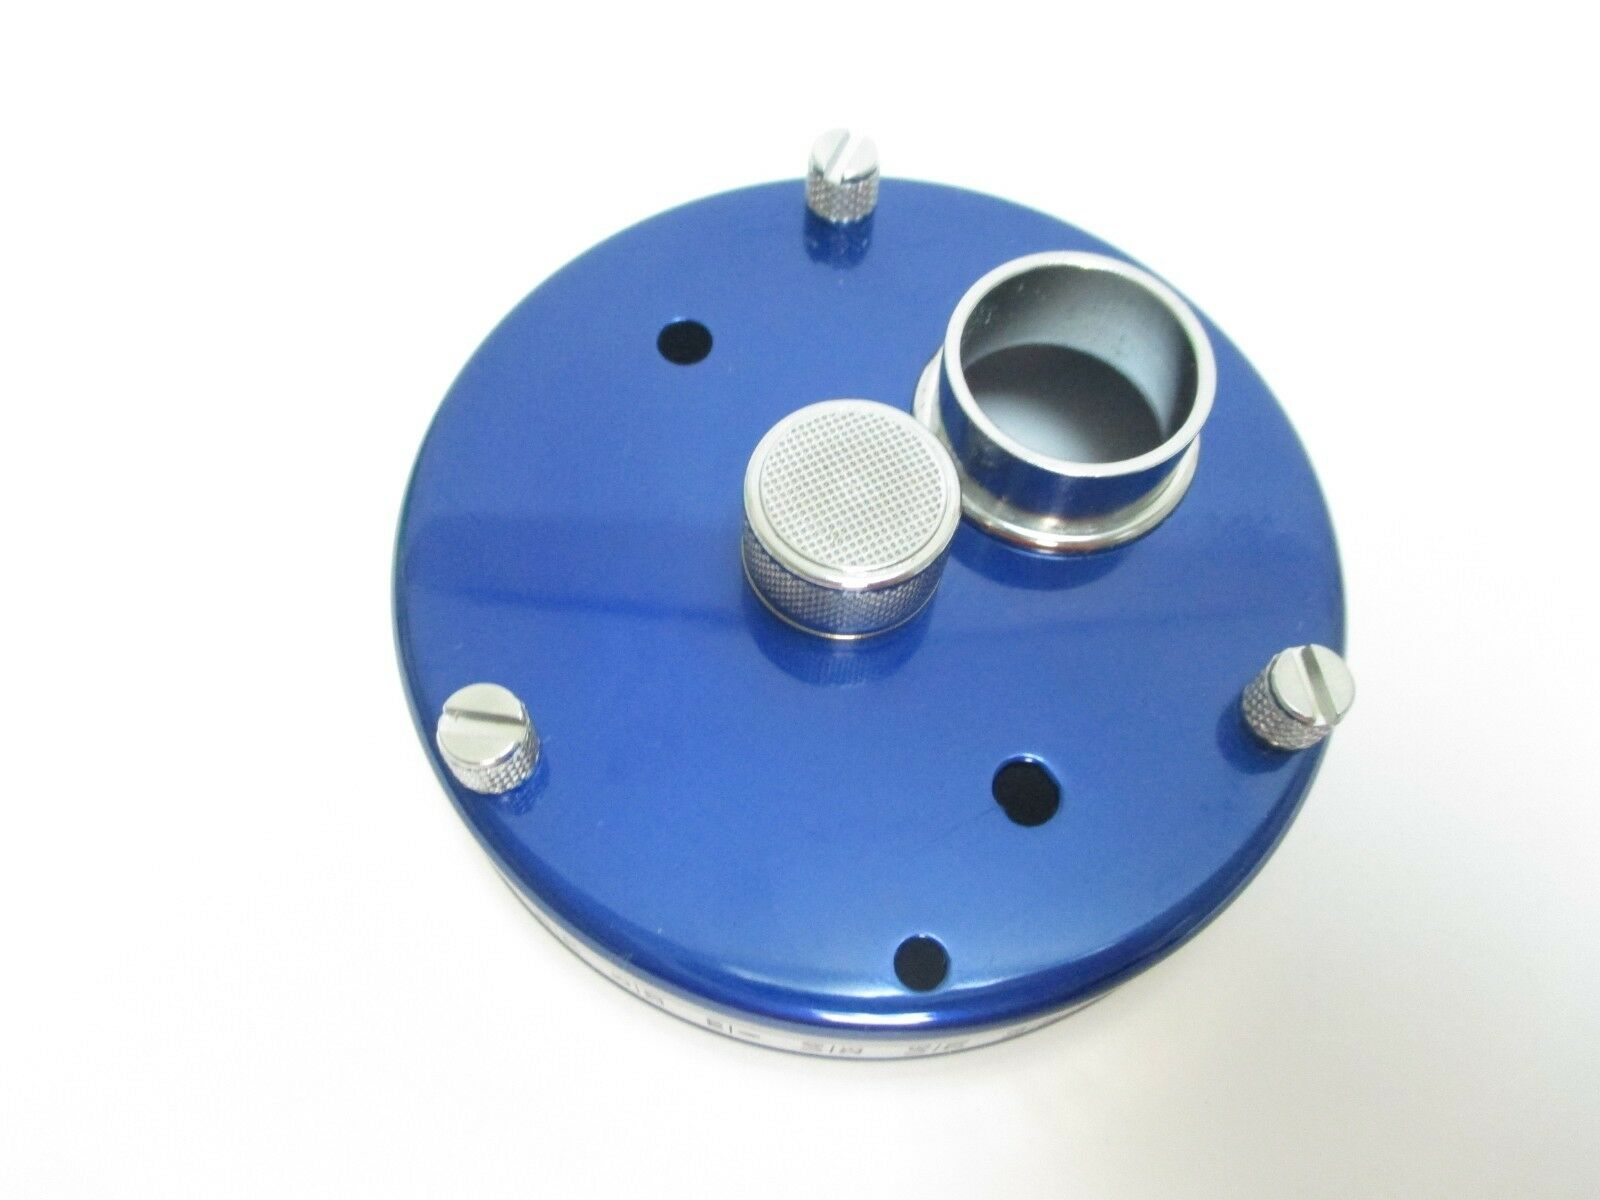 ABU GARCIA REEL PART - Ambassadeur  7000 CT C3 - Right Side Plate -blueE YONDER  A  fast shipping